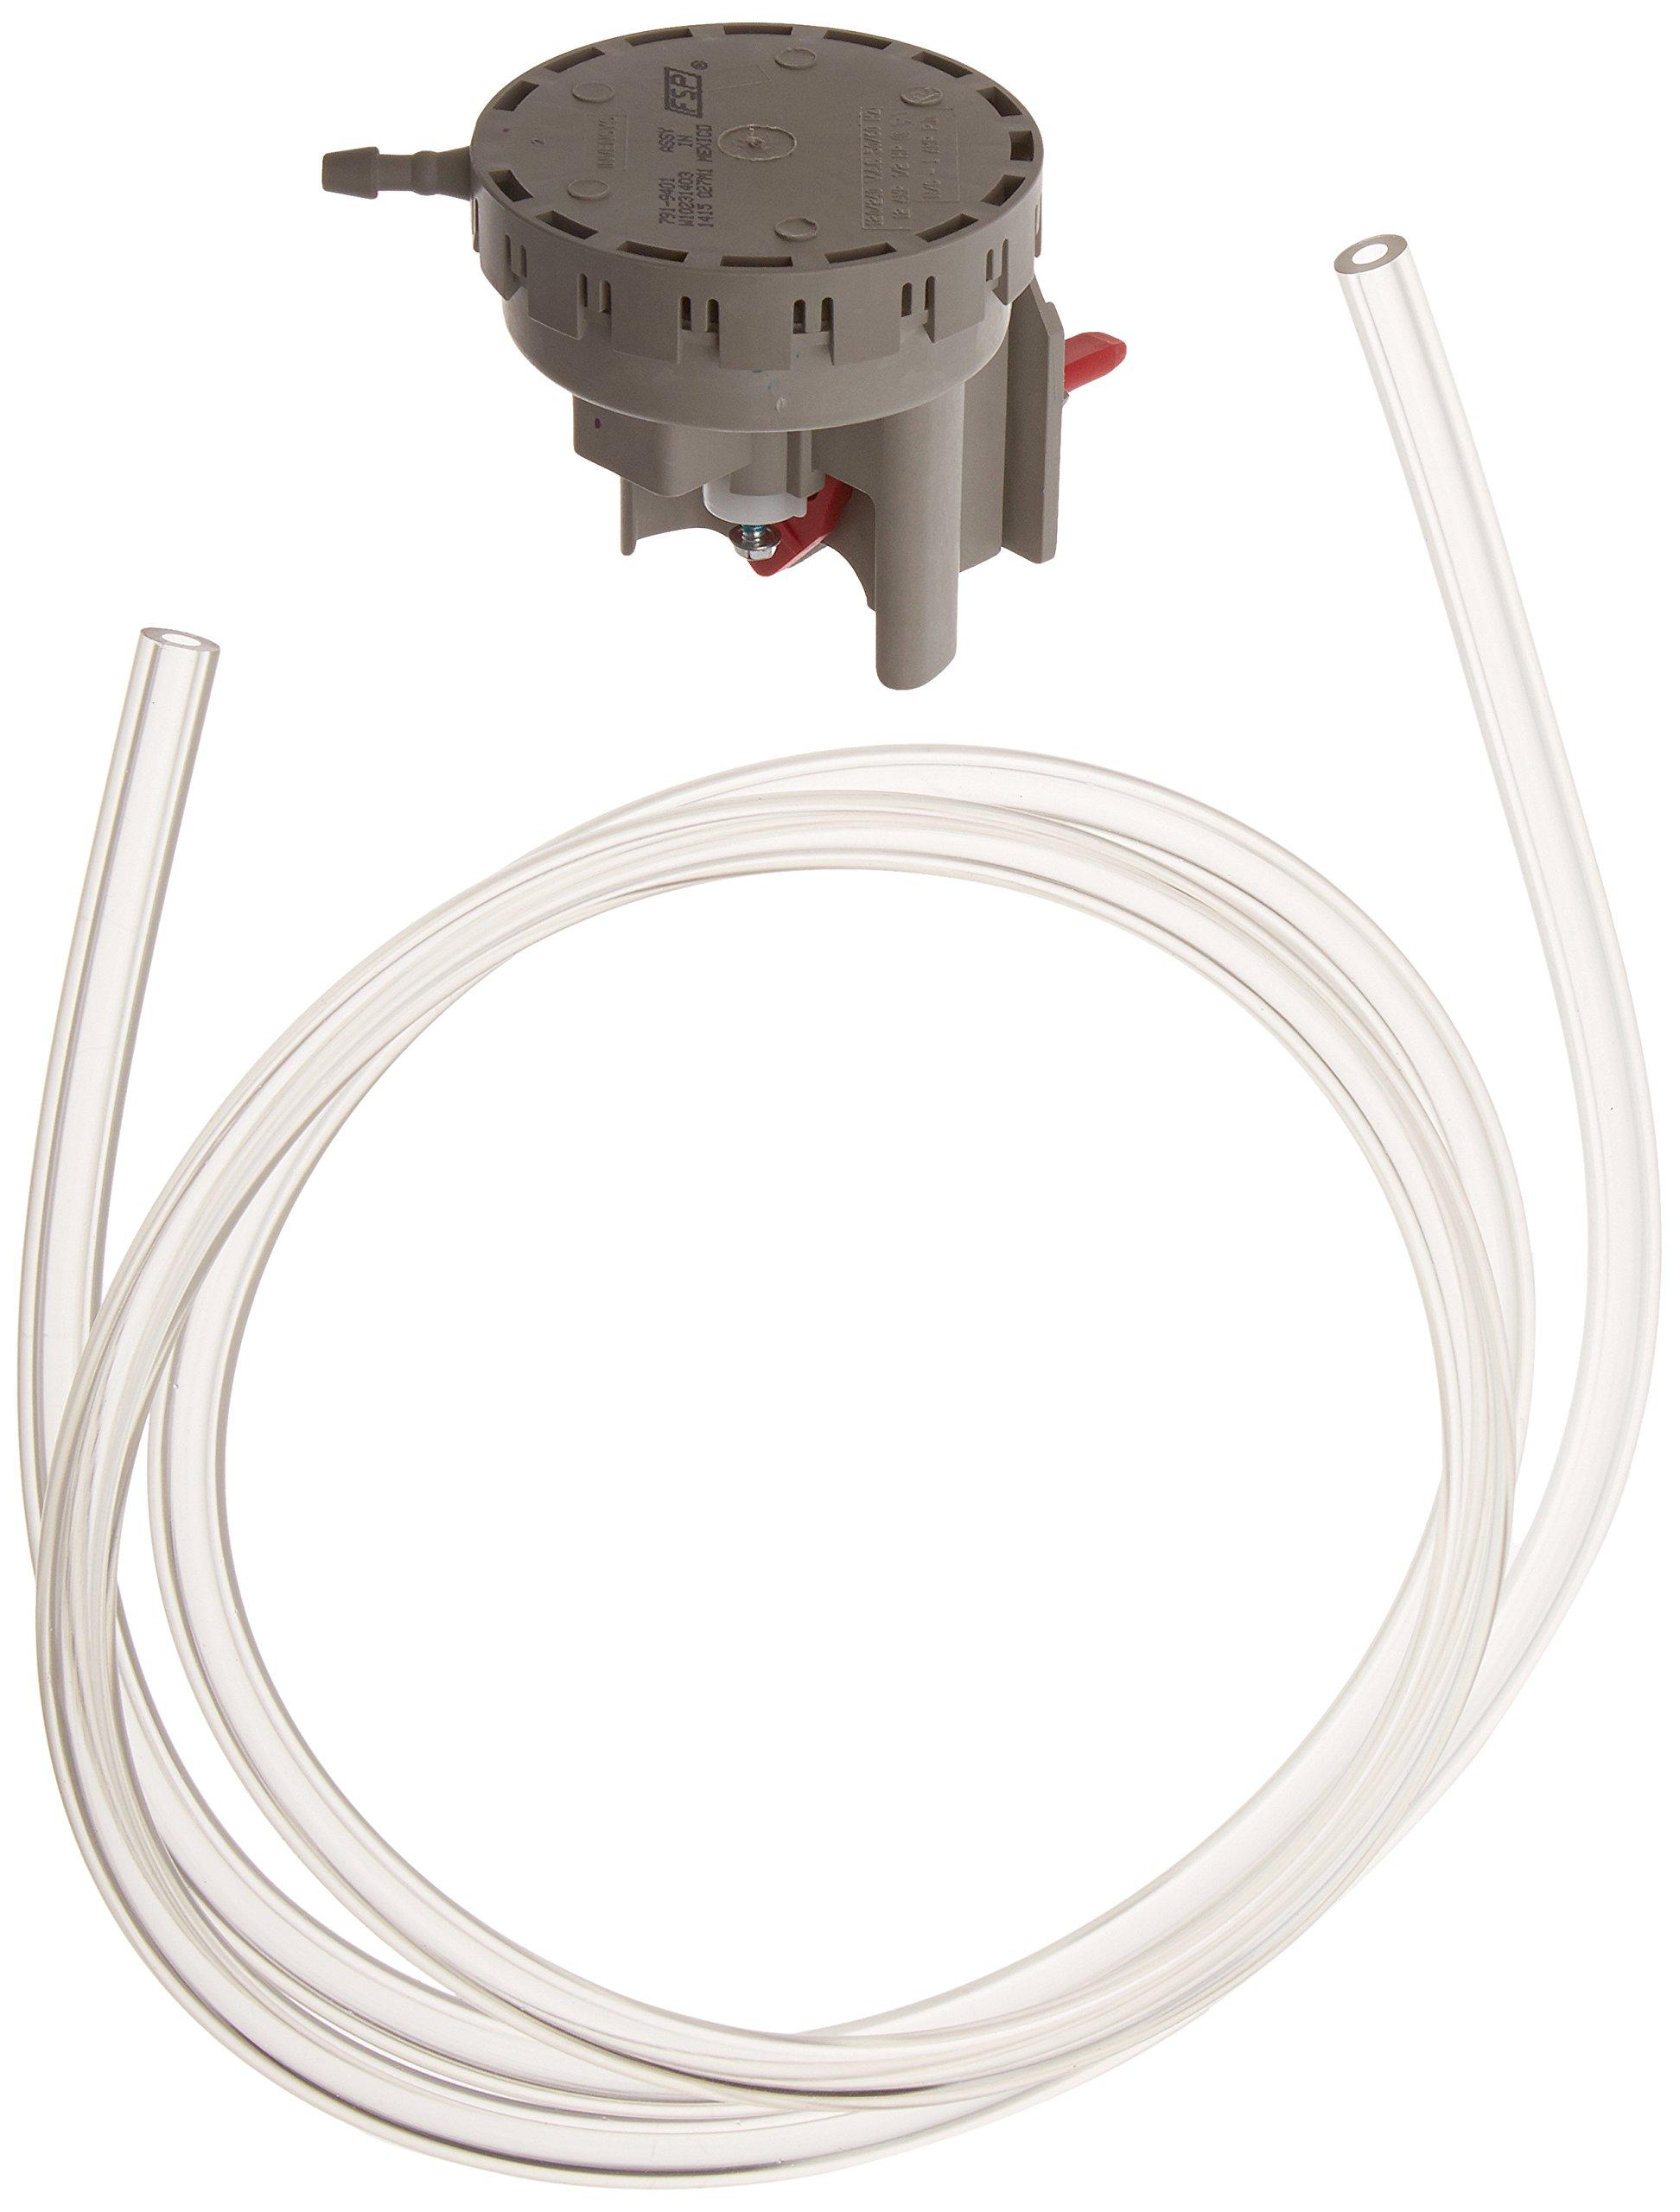 Whirlpool W10339251 Water Level Switch